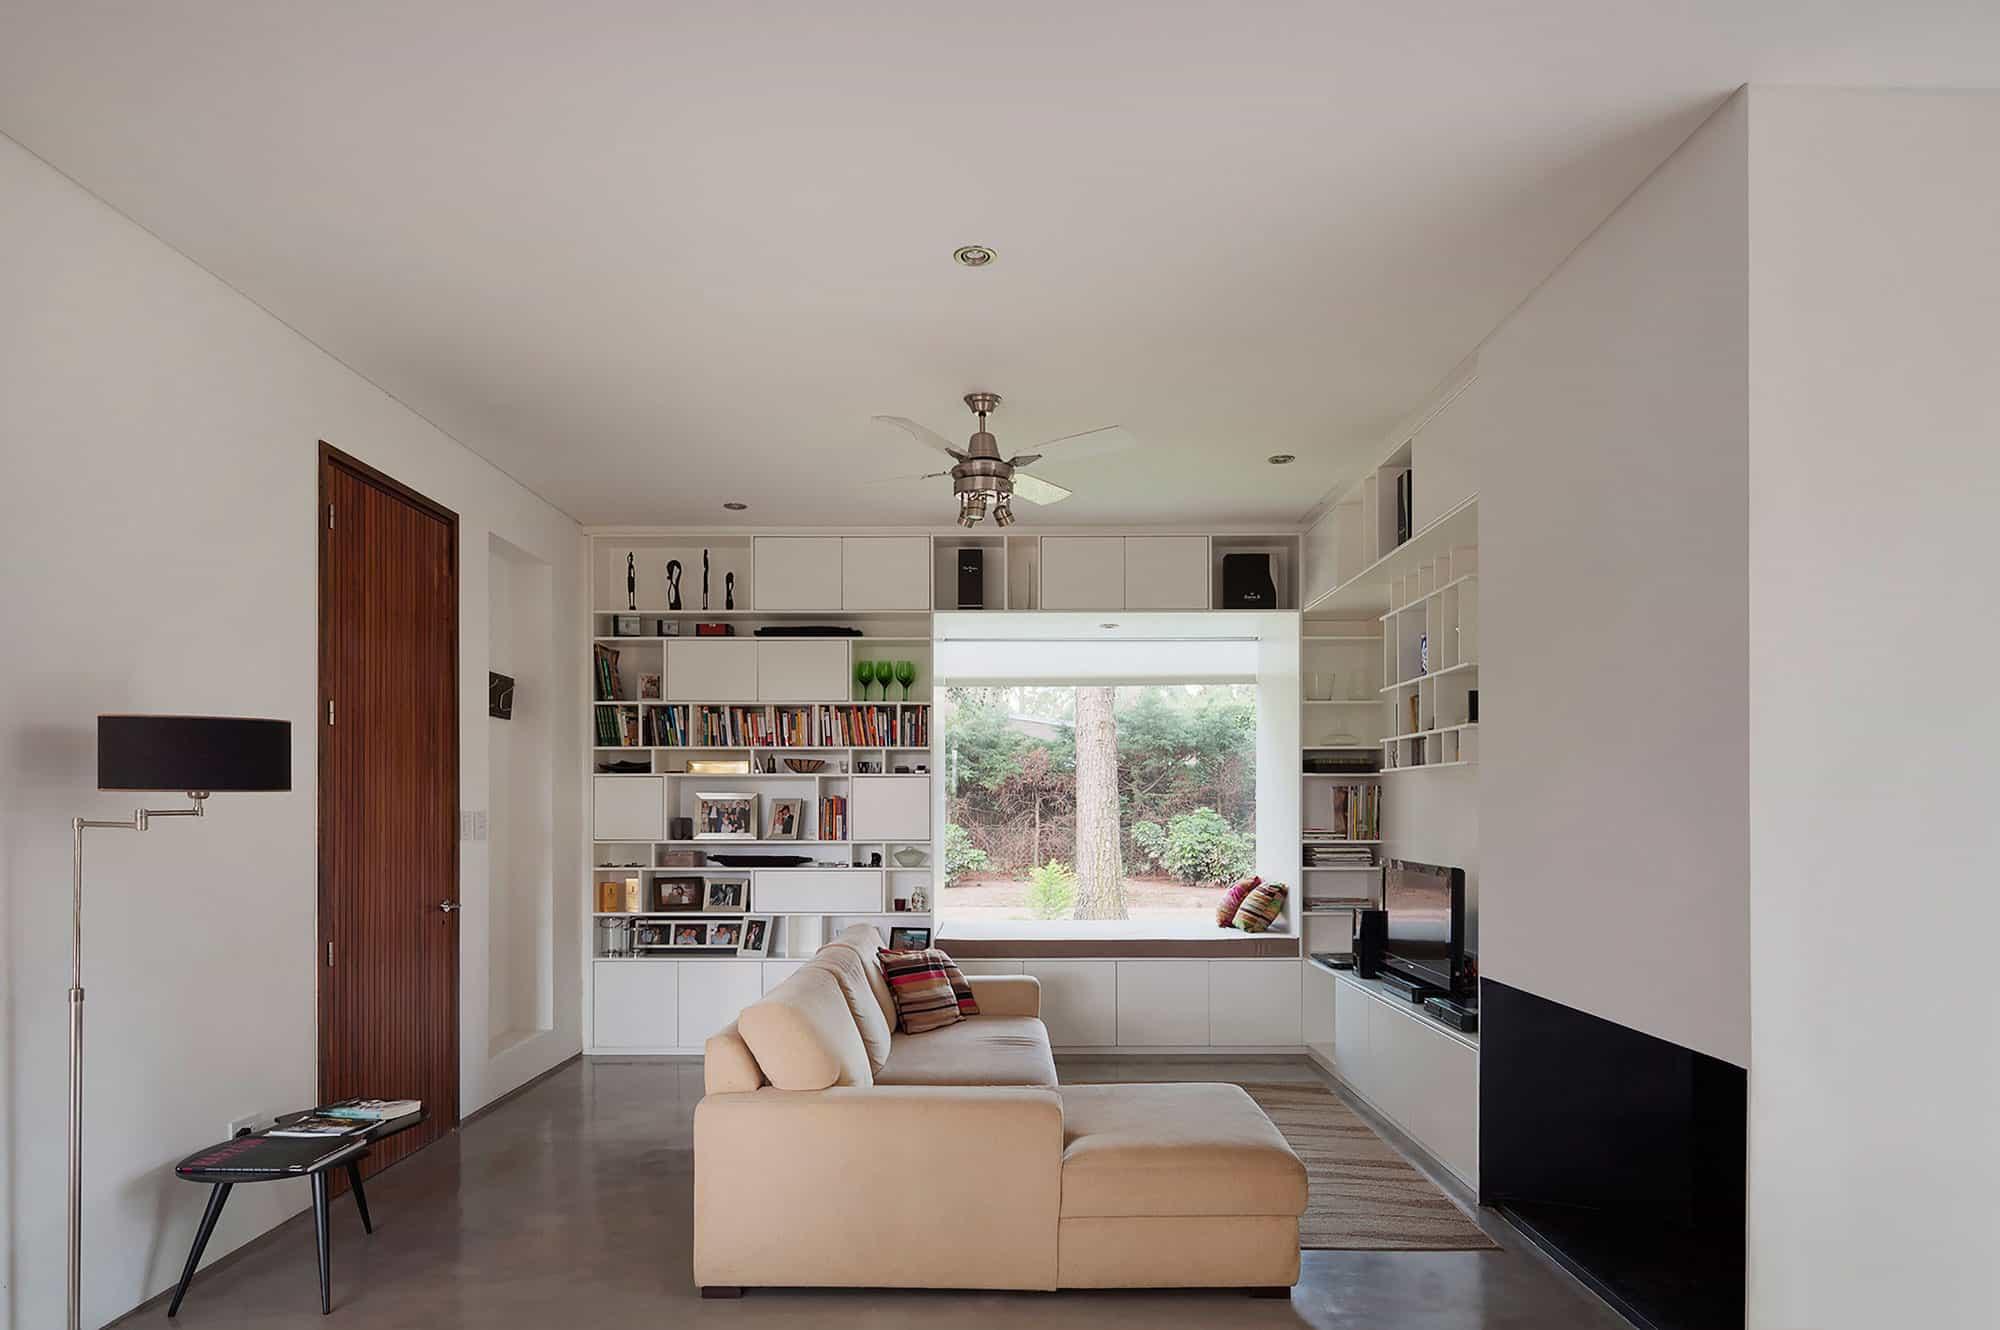 House in El Pinar by Nicolas Bechis